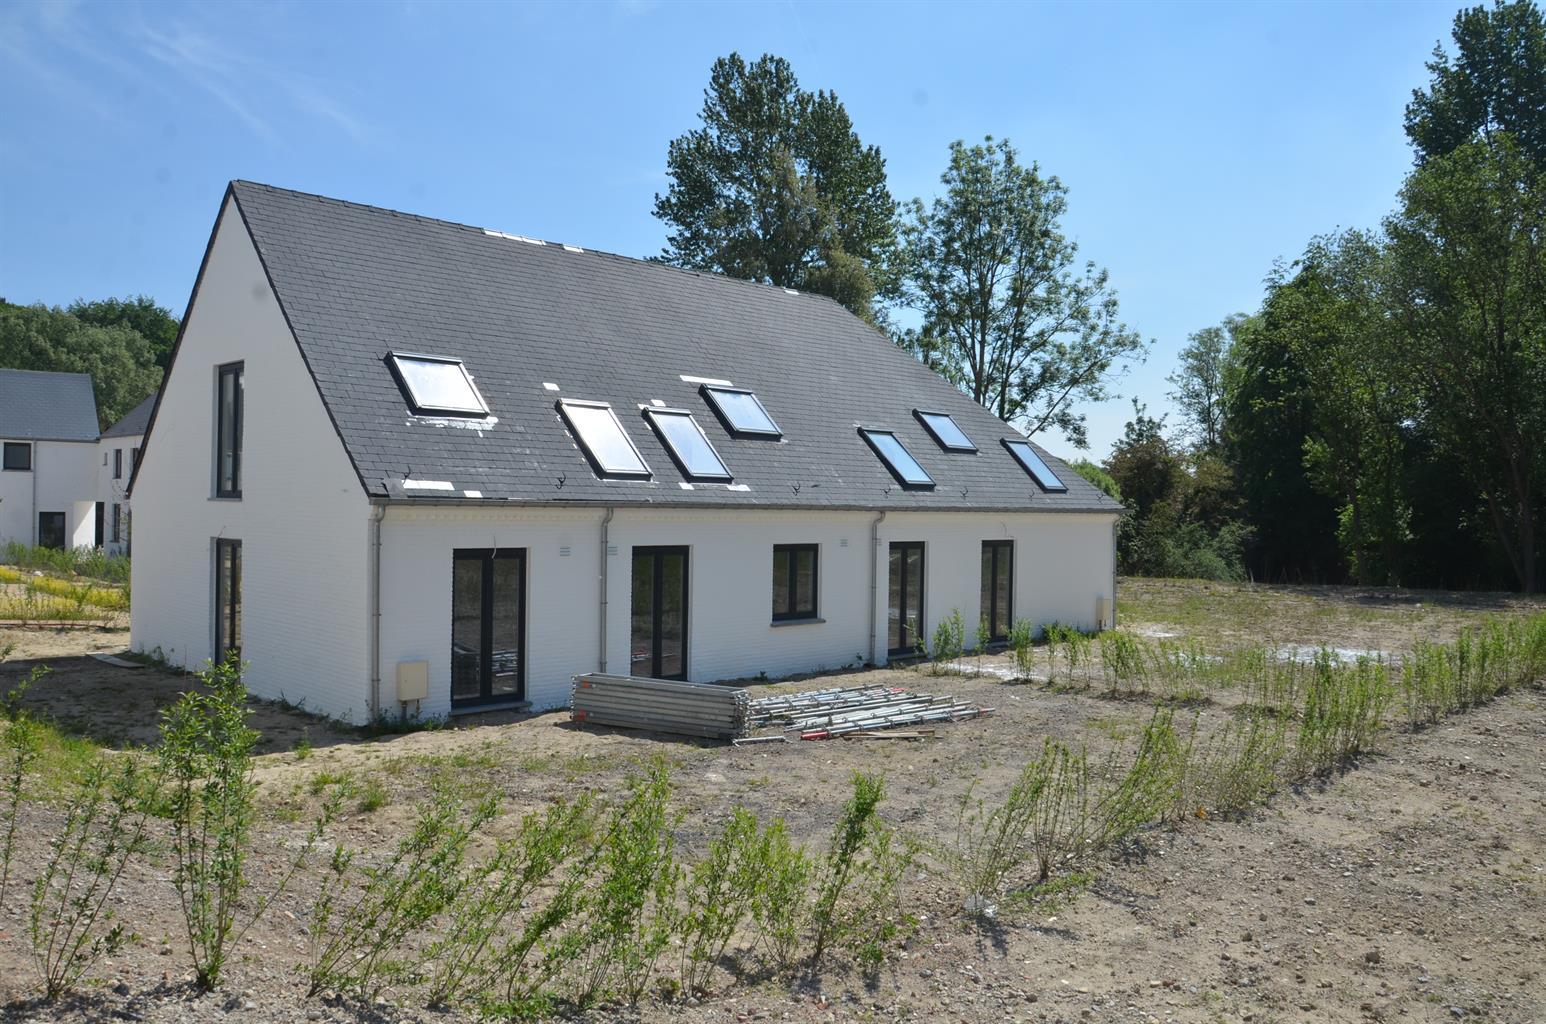 Maison - Genappe Bousval - #4074823-3